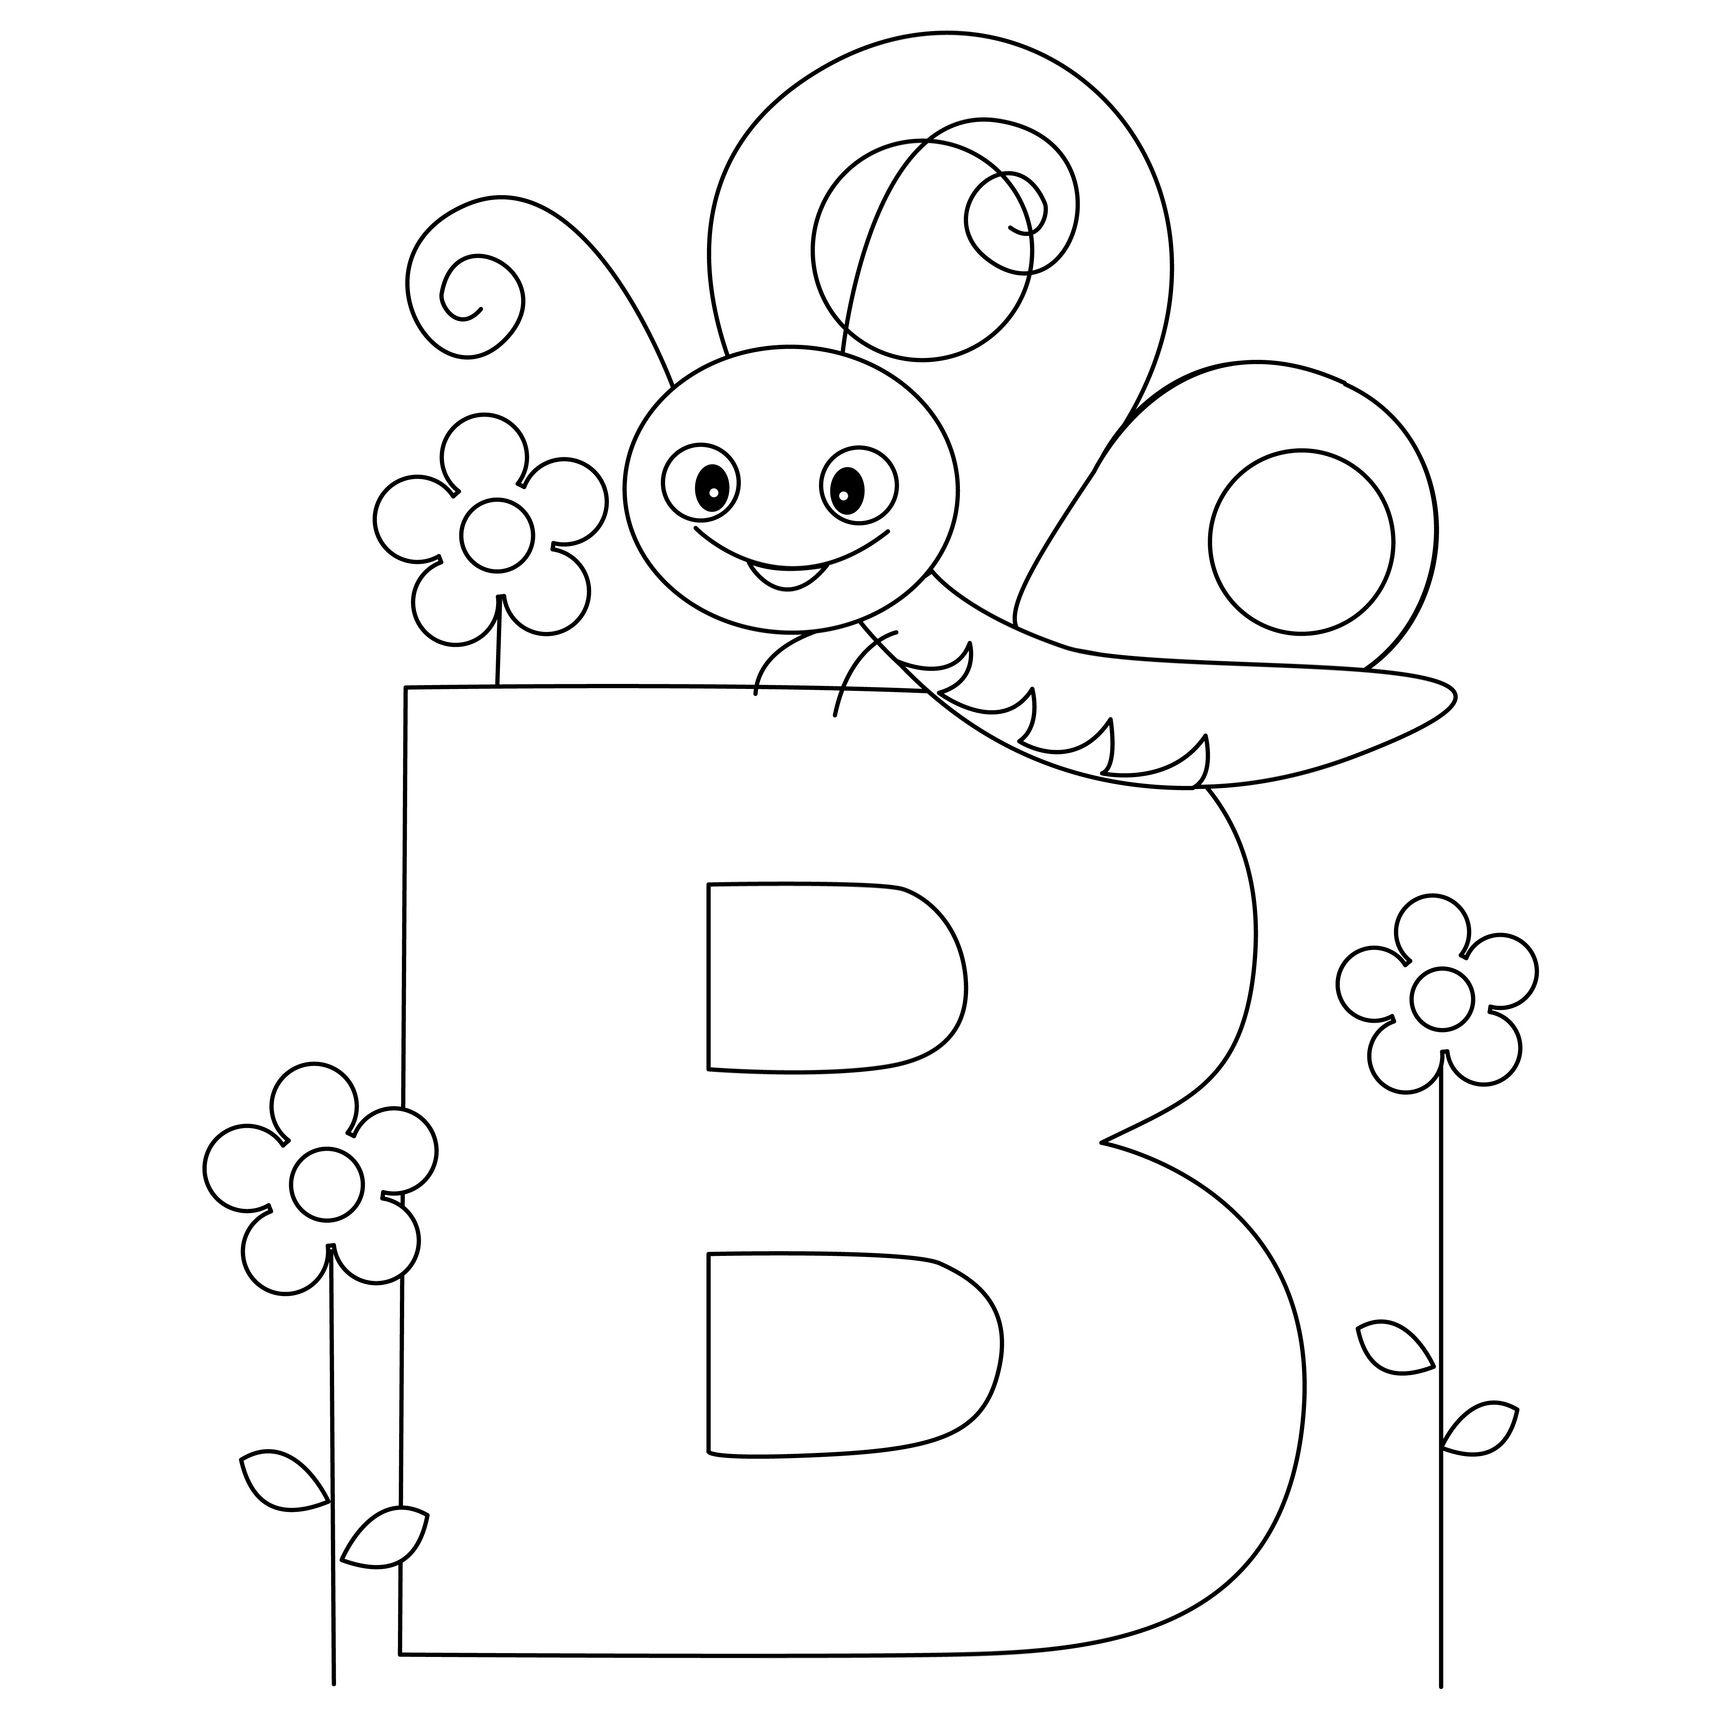 Pinj3N _ On Homeschool | Letter Work | Pinterest | Alphabet - Free Printable Animal Alphabet Letters